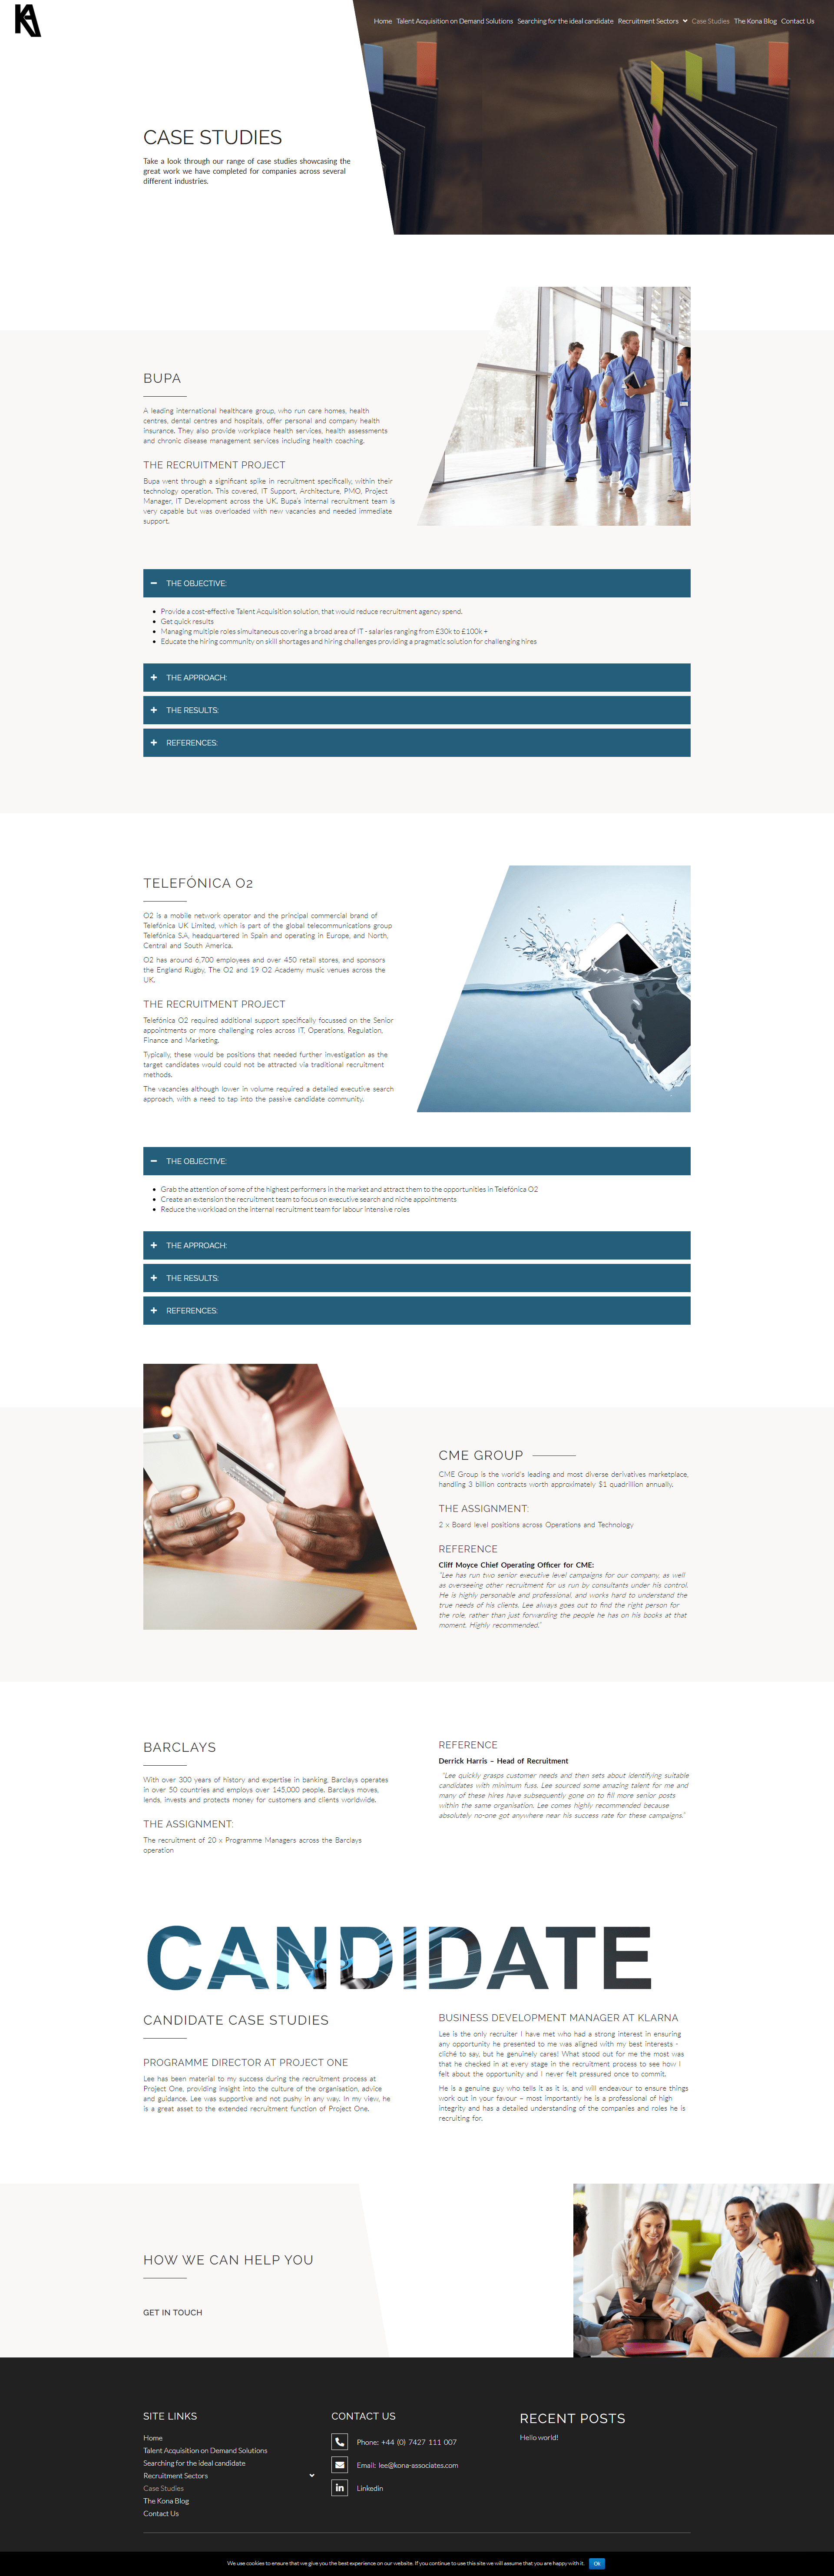 Kona Associates Case Studies Page